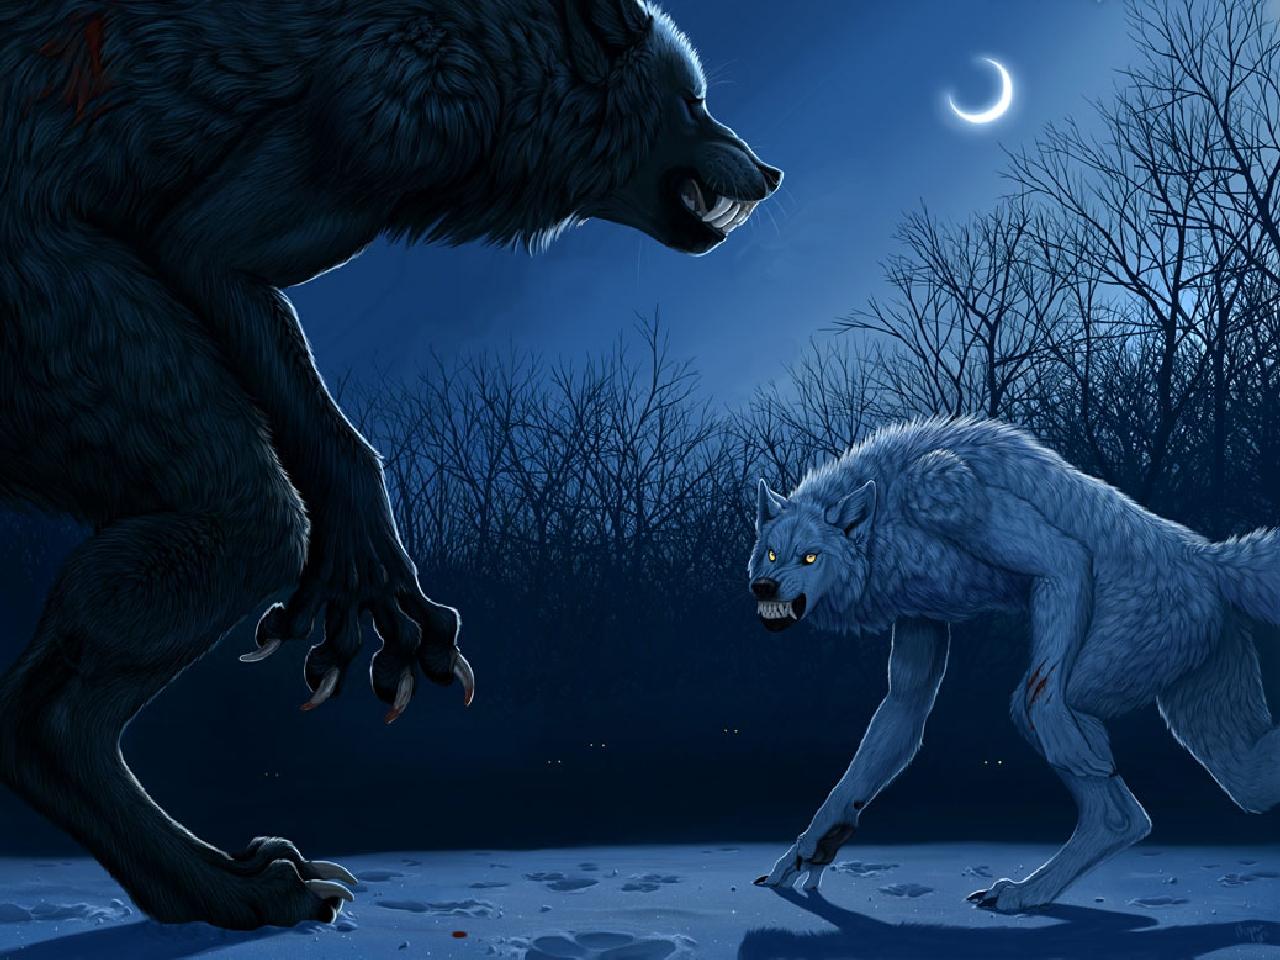 Werewolf Computer Wallpapers Desktop Backgrounds 1280x960 ID 1280x960